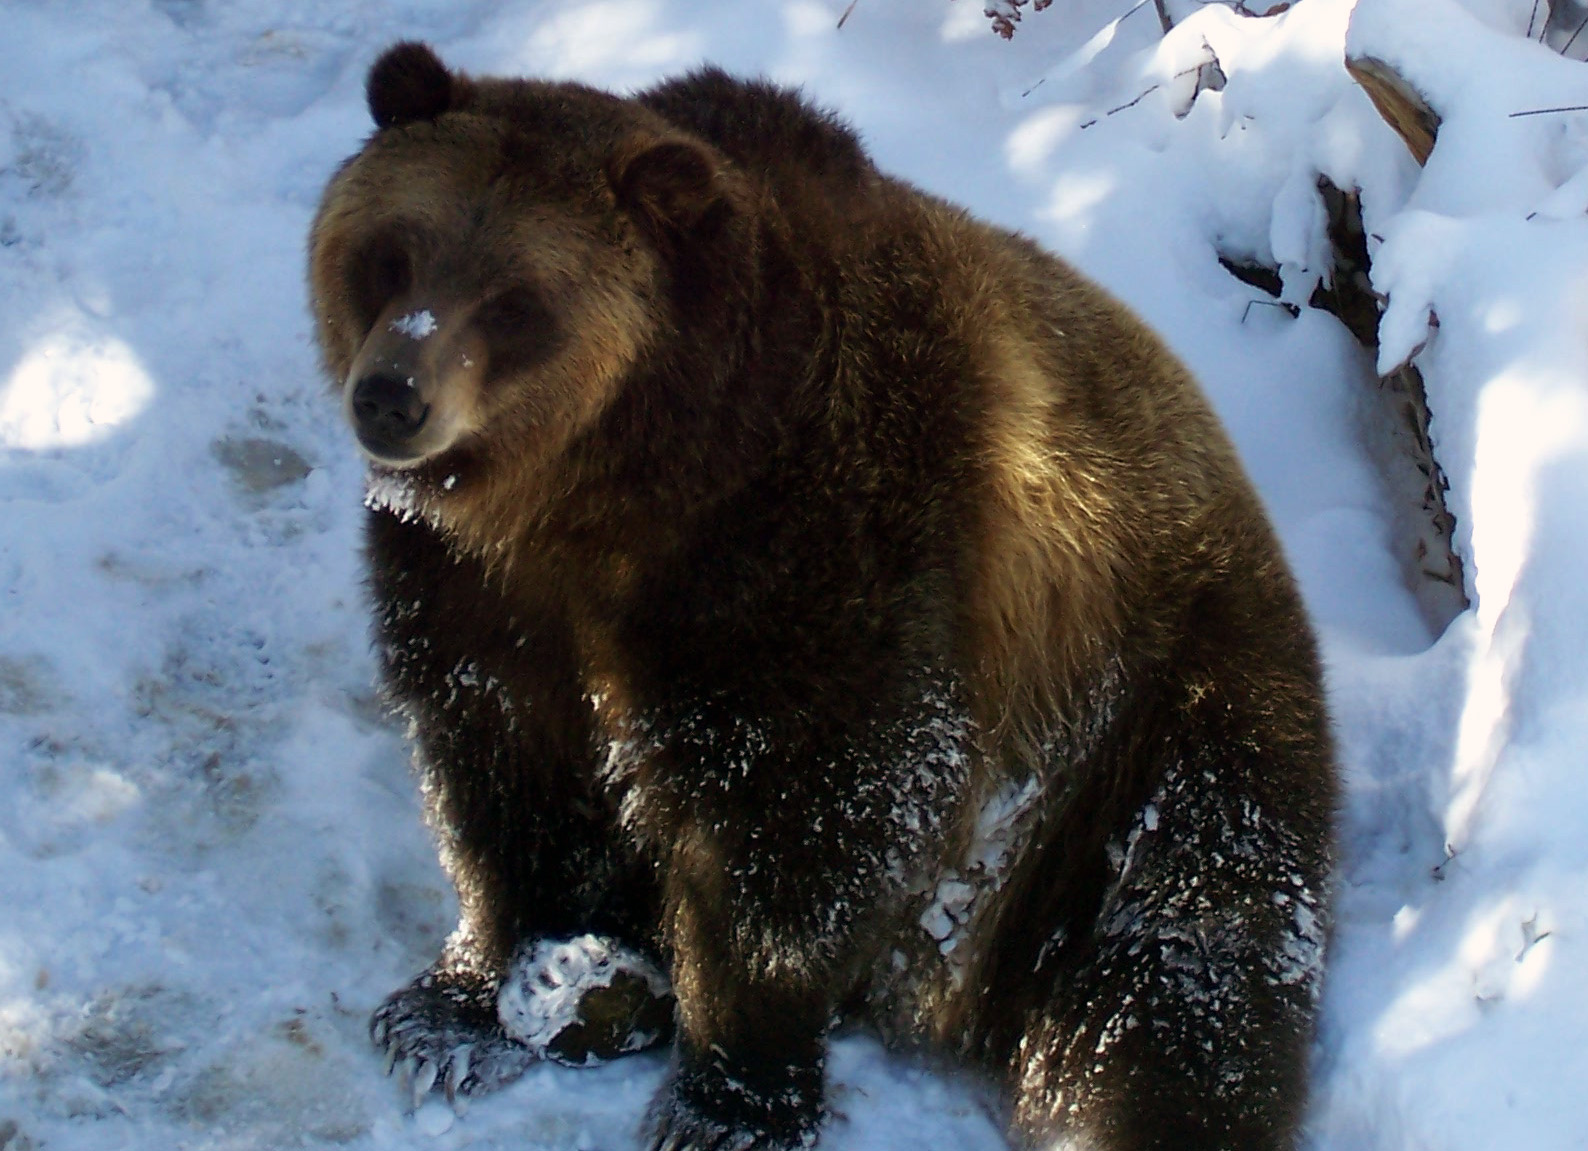 Hibernating Bear Clip Art | Search Results | Calendar 2015